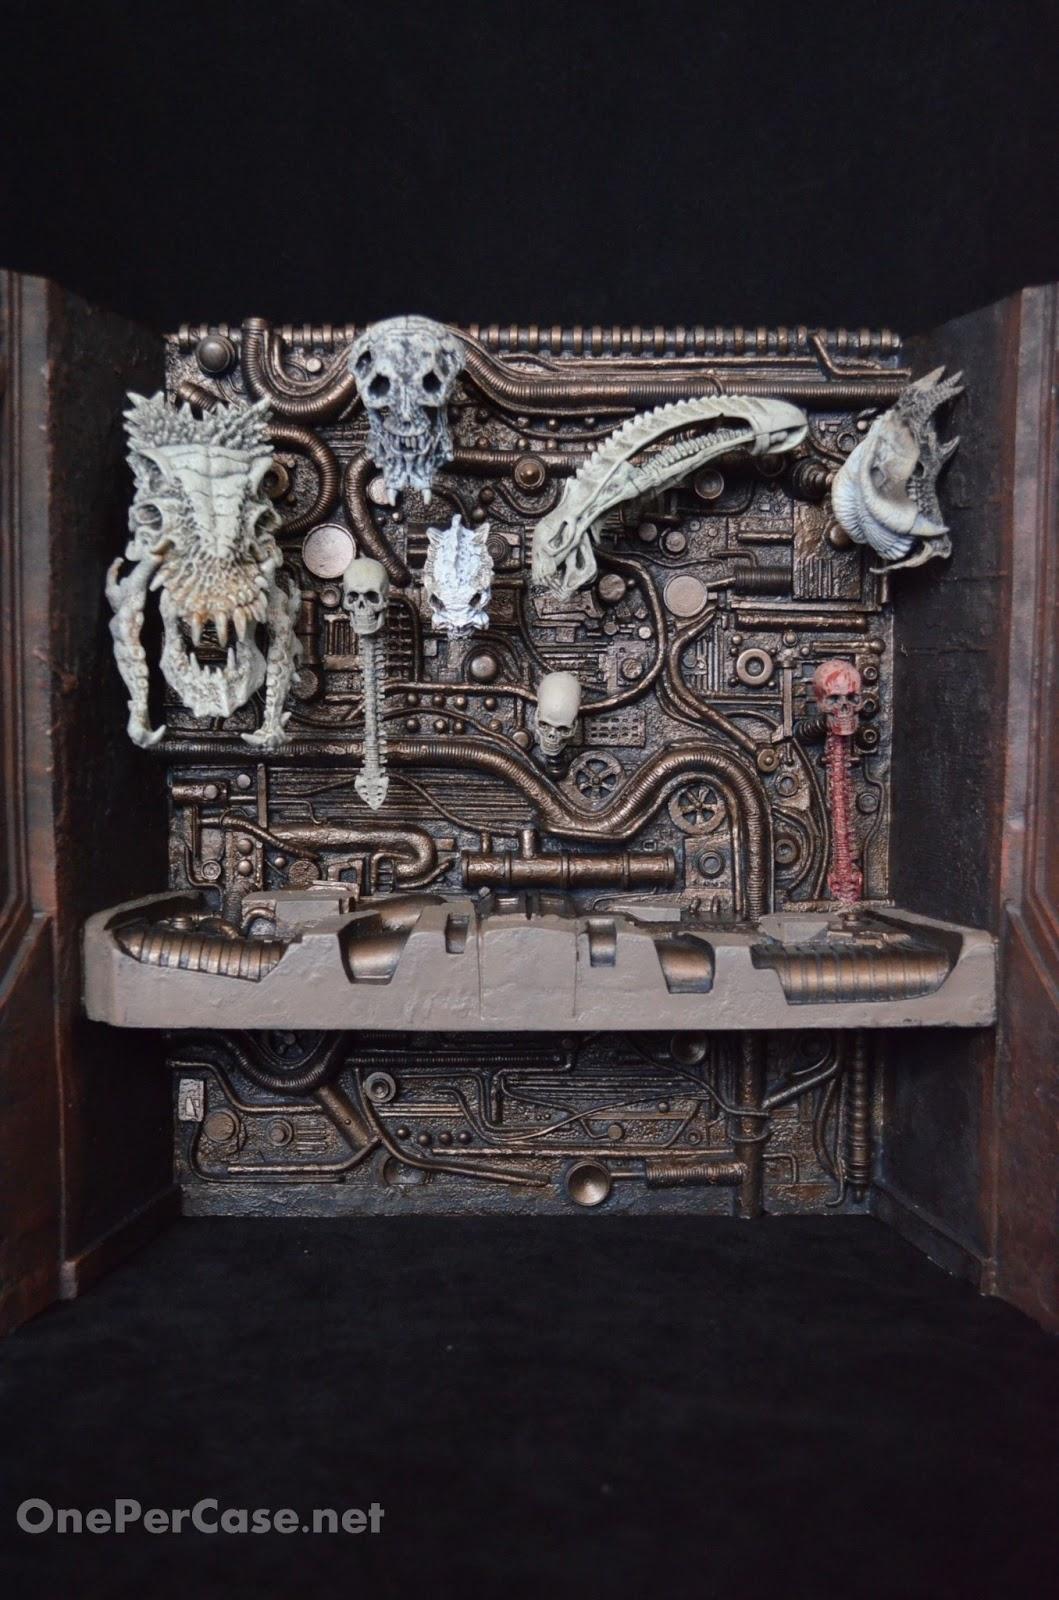 NECA Predator 2 Trophy Skull Wall Action Figure Diorama One Per Case (20).JPG